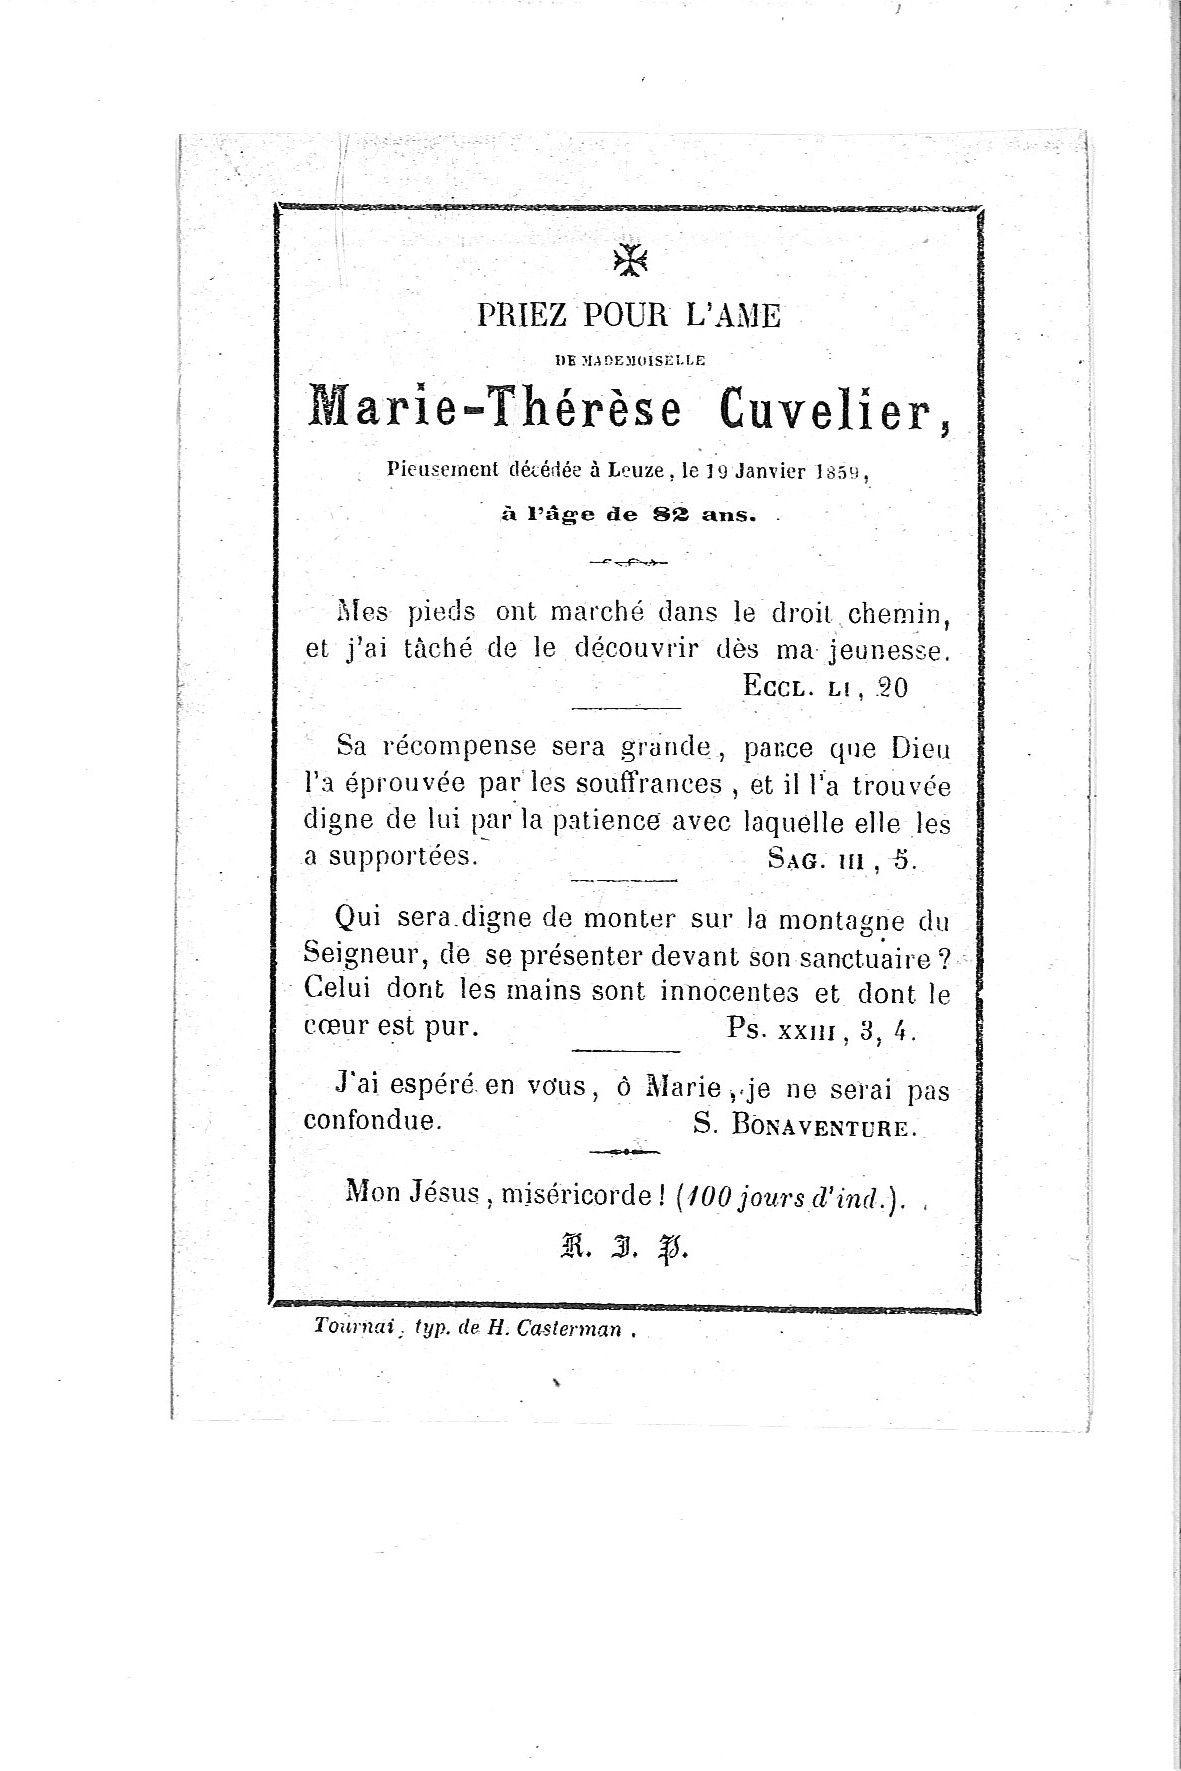 Marie-Thérèse(1859)20090916171417_00052.jpg